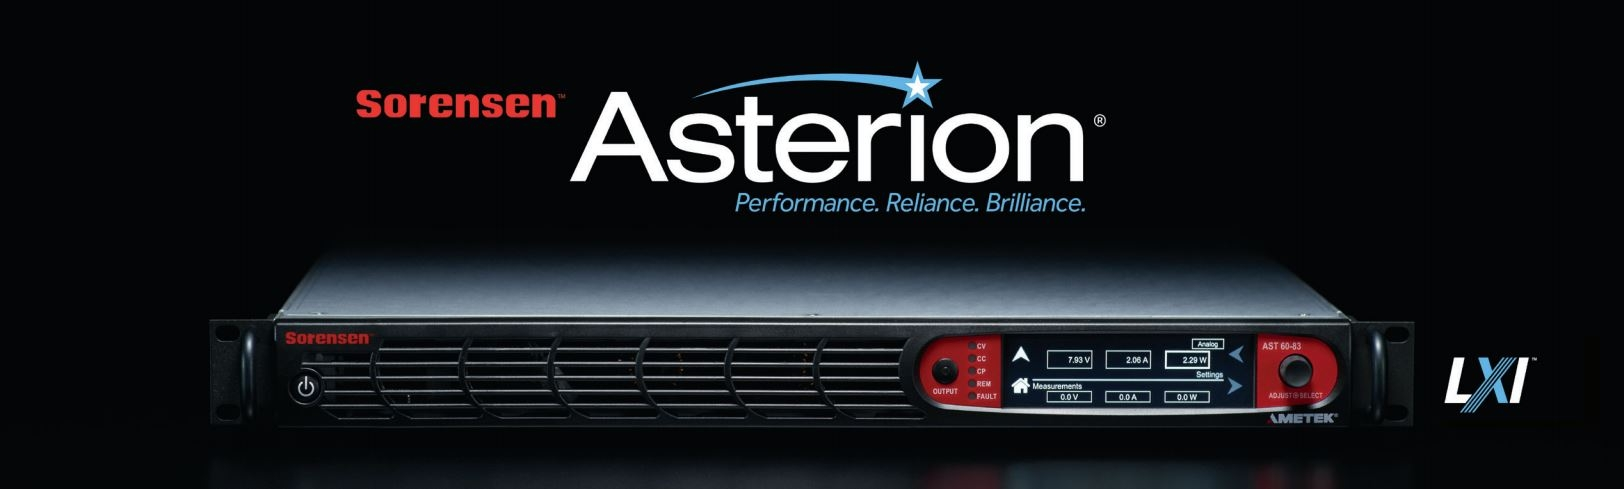 Sorensen Asterion DC Series - High Performance Programmable DC Power Supply